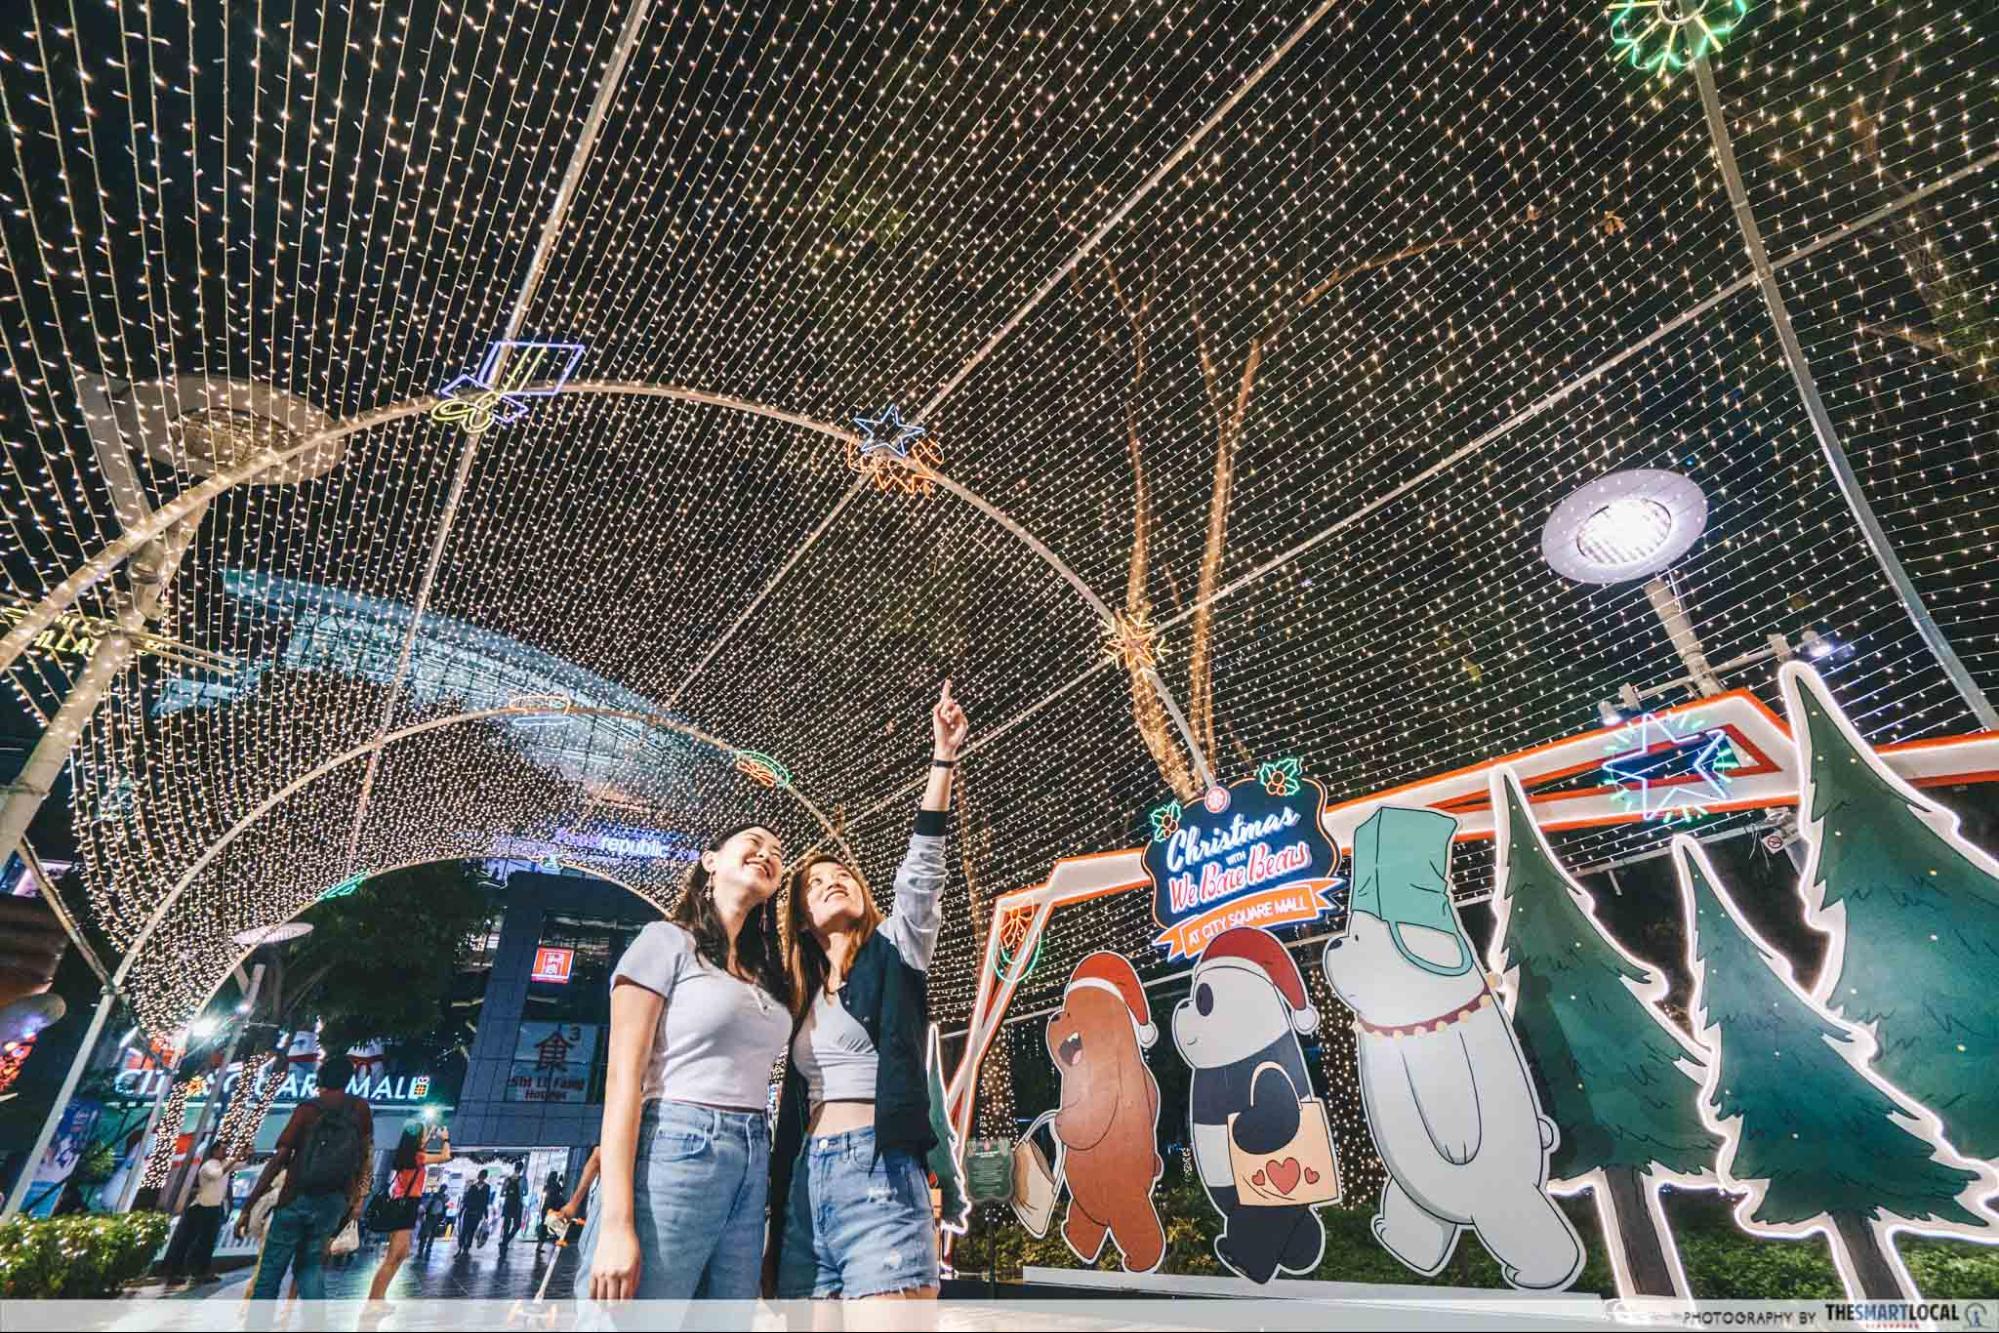 City Square Mall Christmas 2019 We Bare Bears Singapore